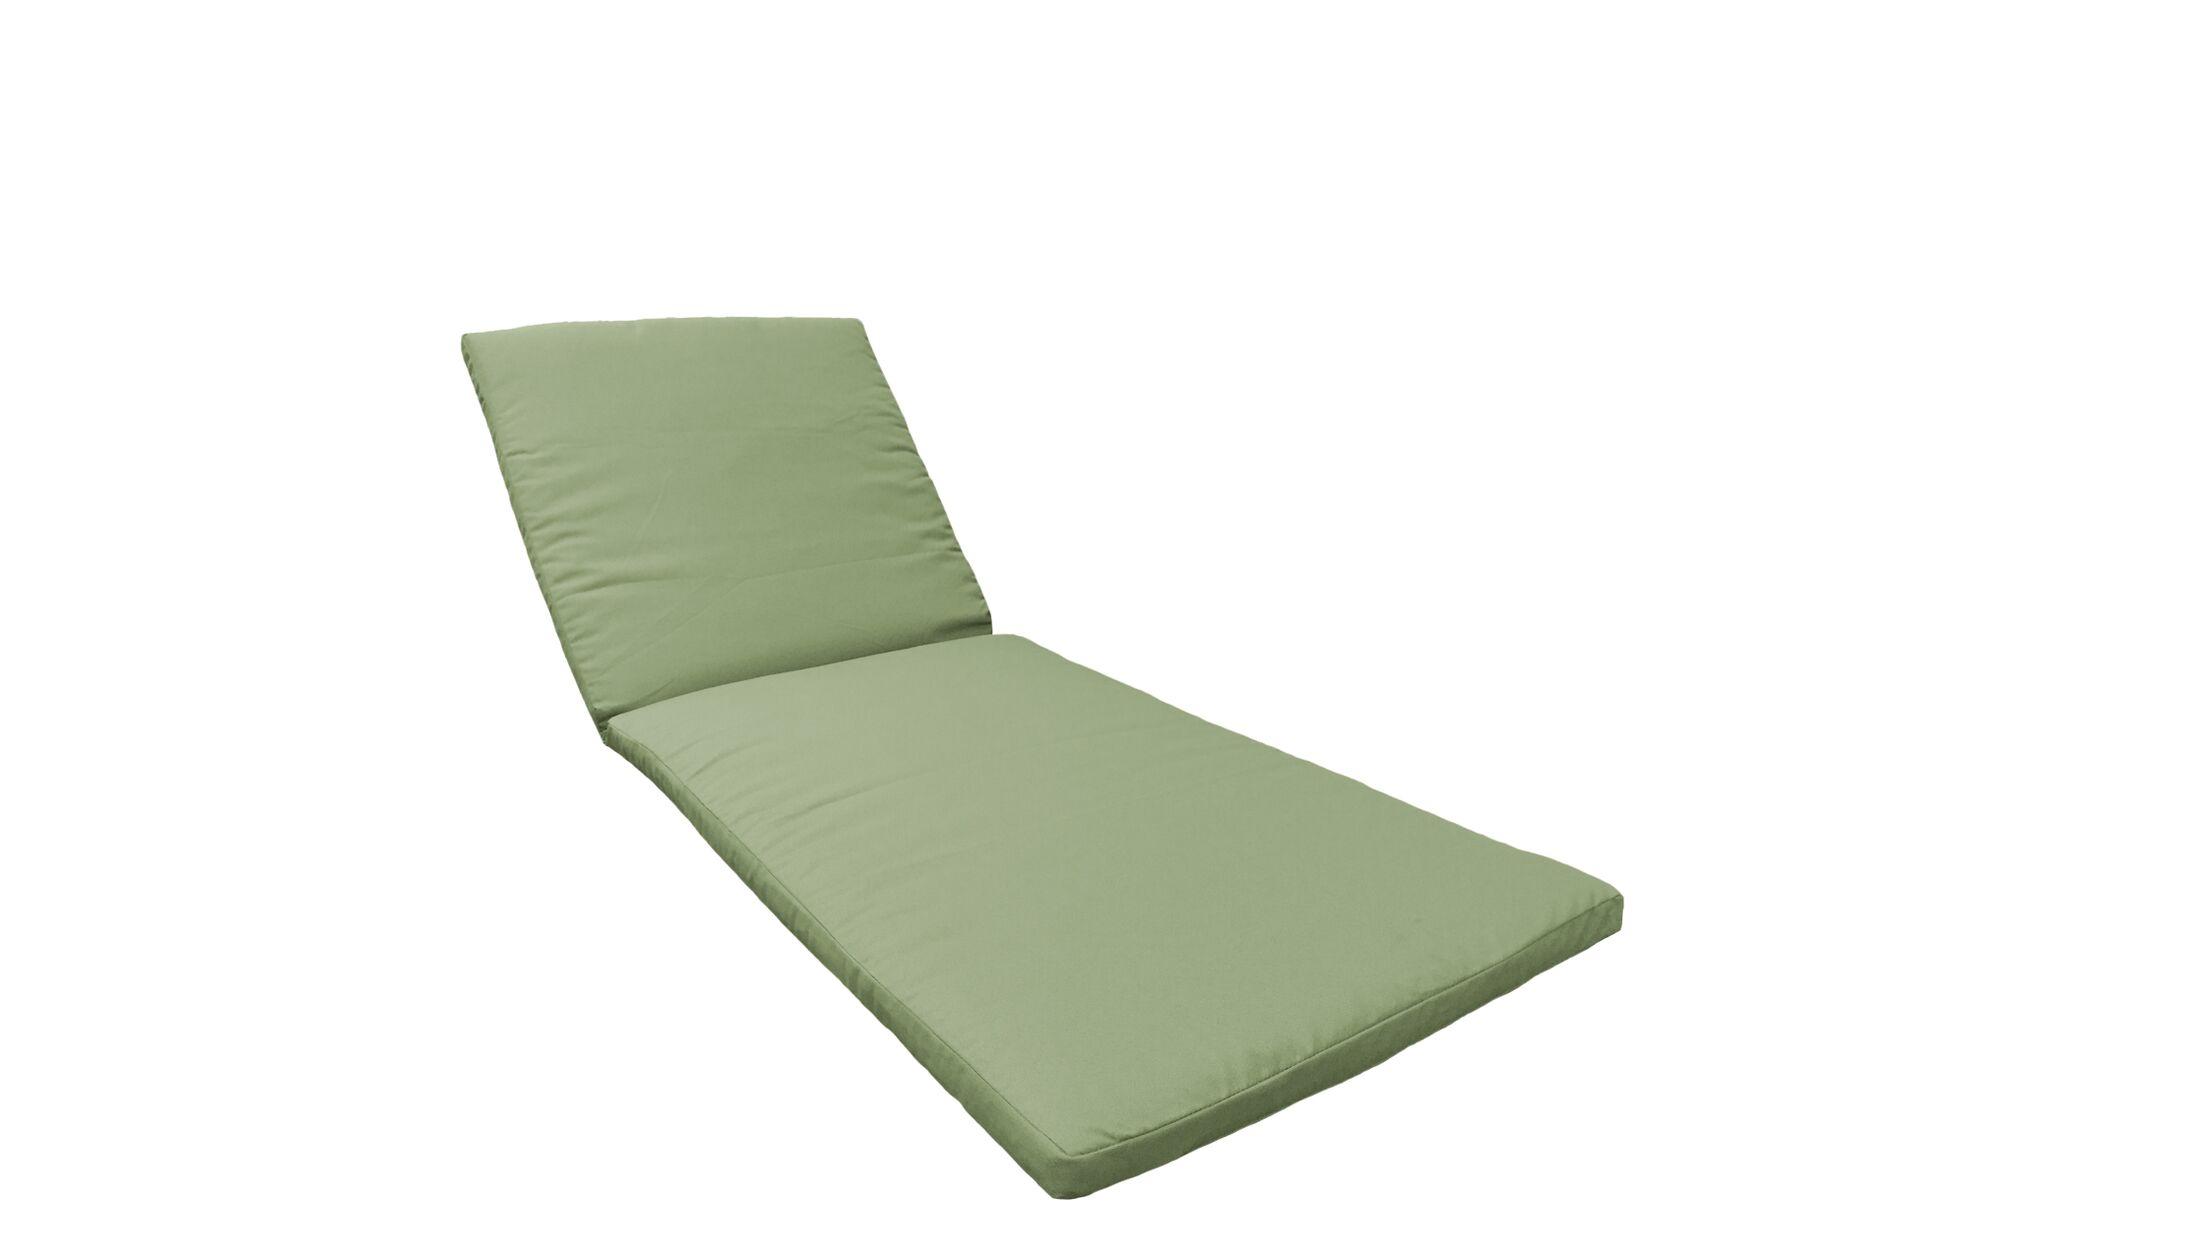 2 Piece Outdoor Chaise Lounge Cushion Set Fabric: Cilantro